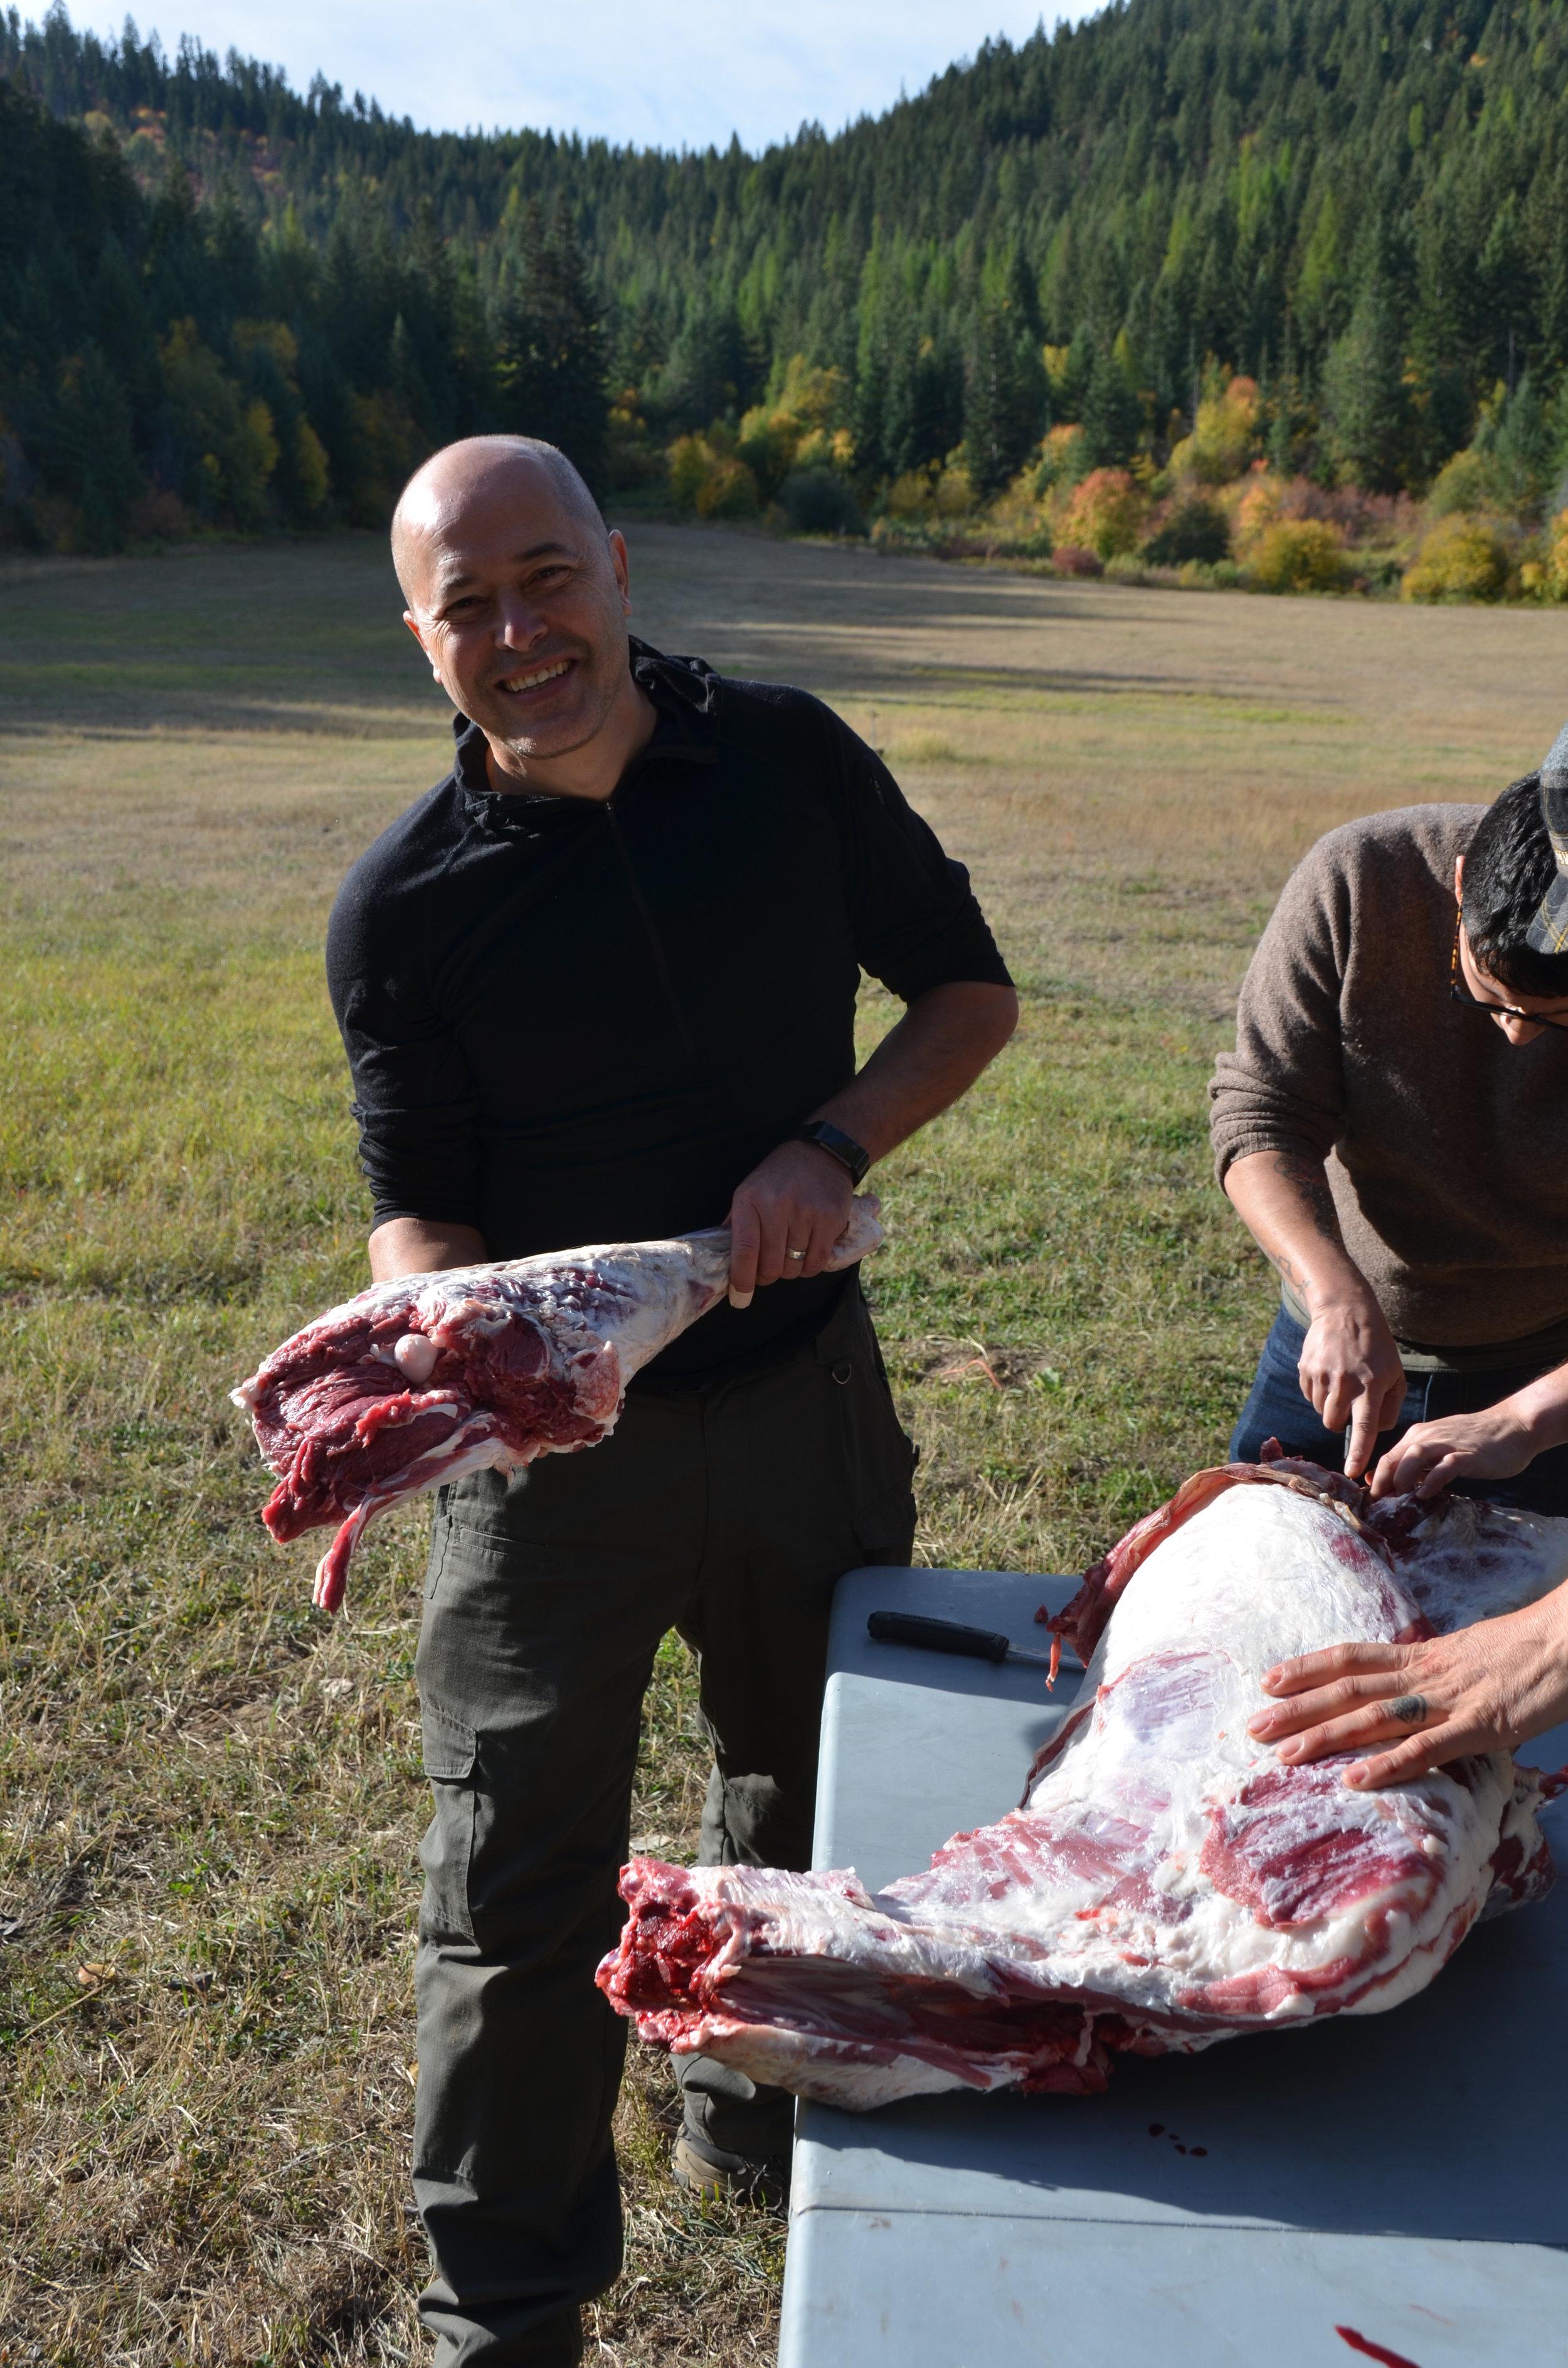 butchering wild game